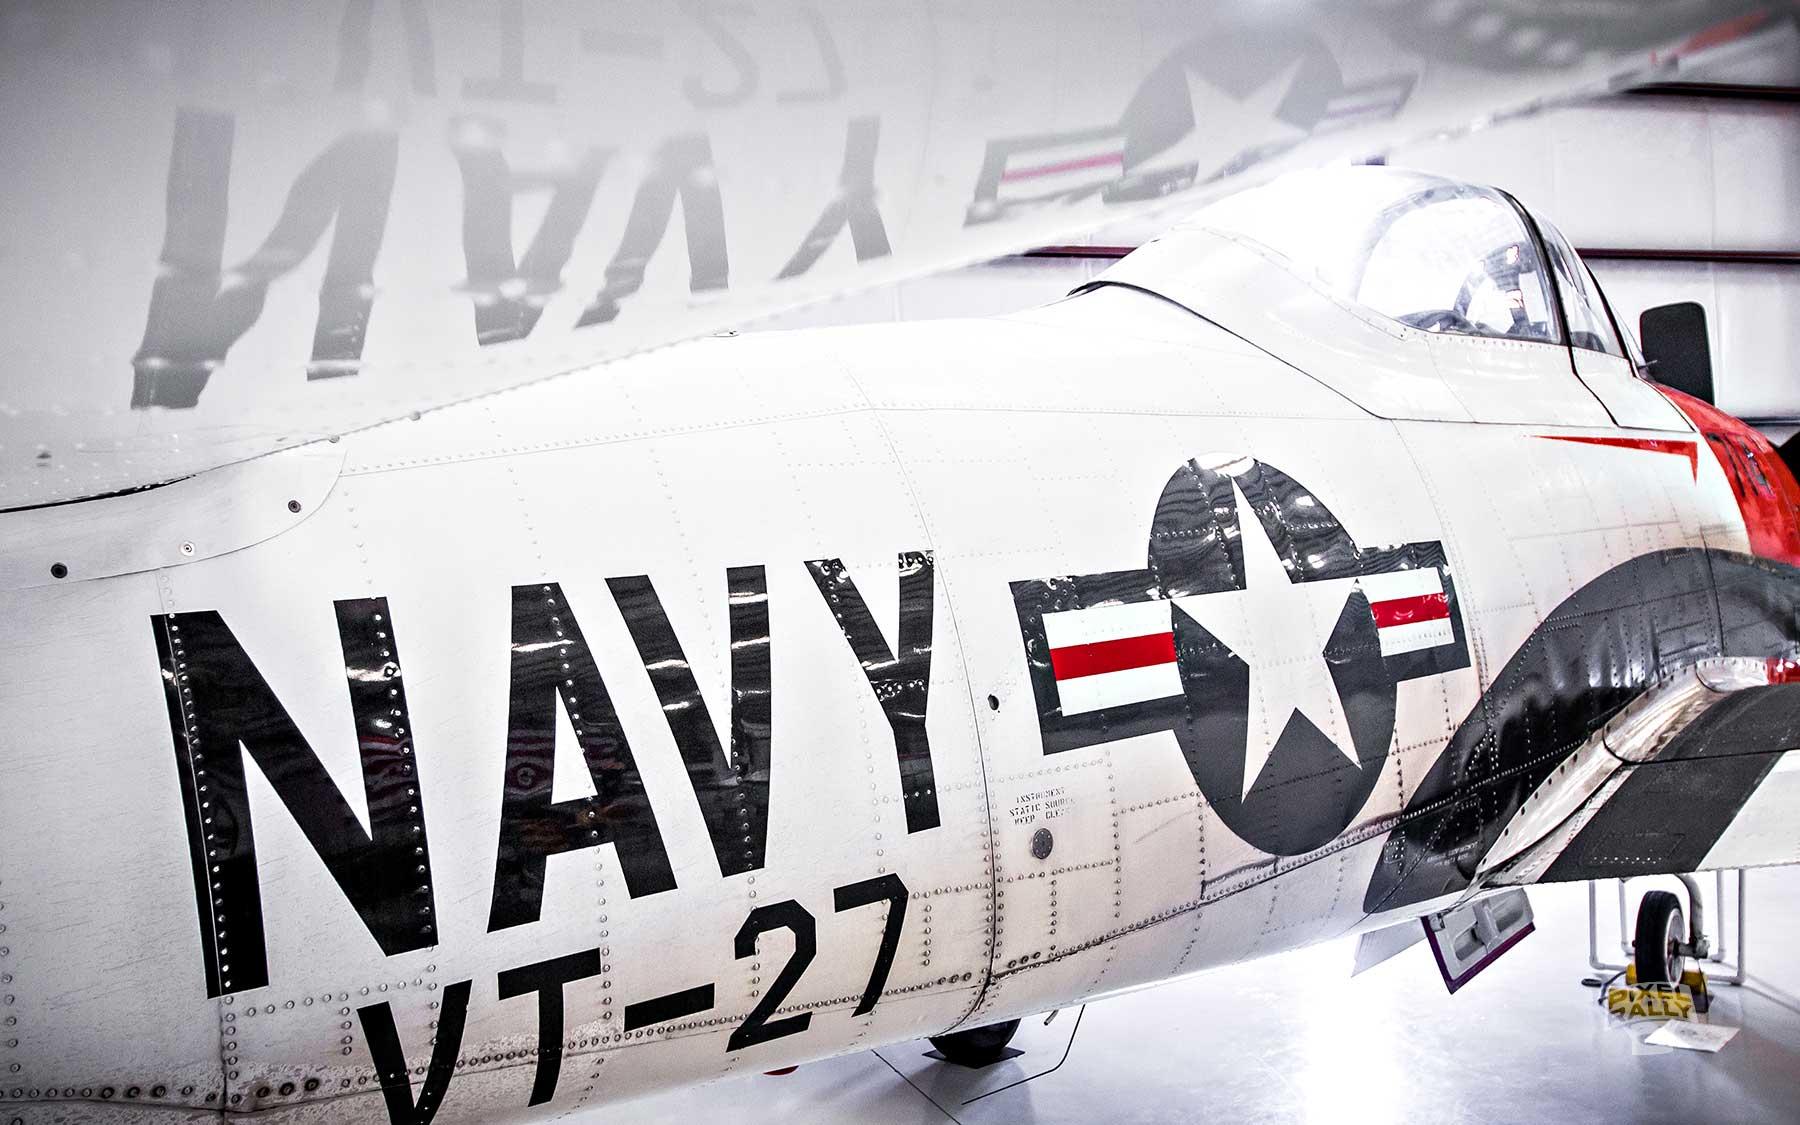 FL-WarbirdsMuseum-jet-NAVY-2